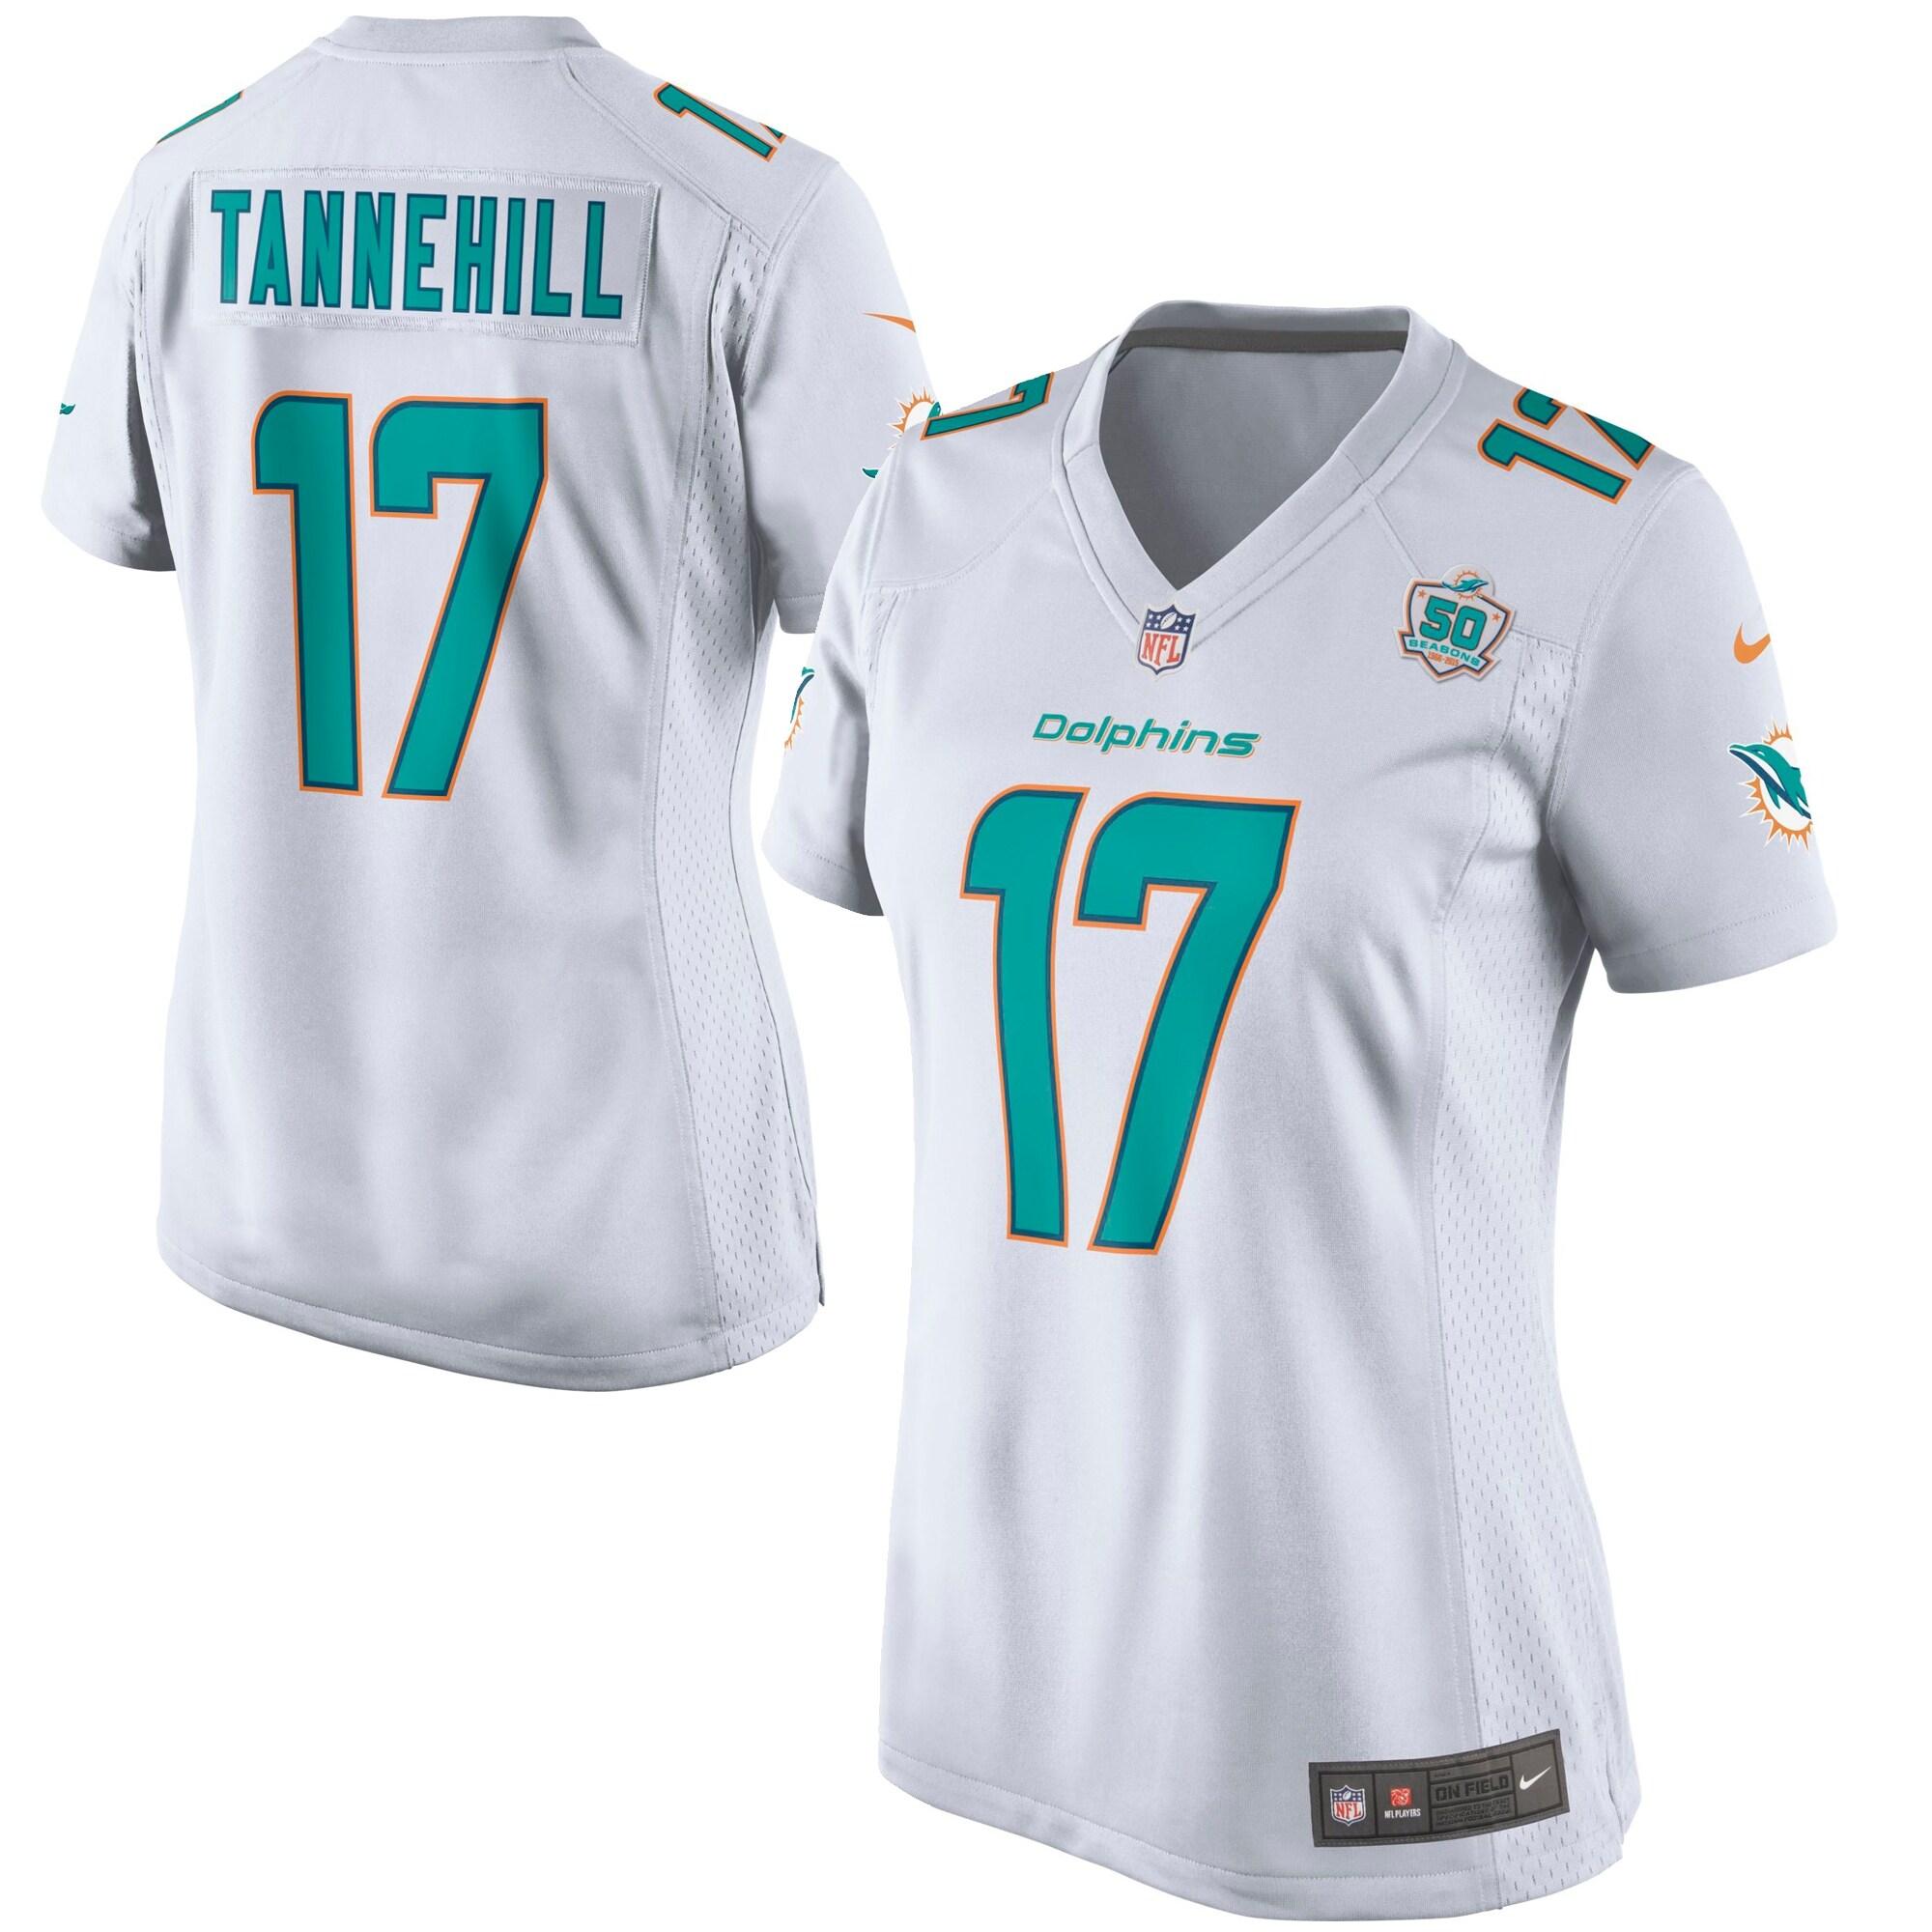 Ryan Tannehill Miami Dolphins Nike Women's White Game 2015 NFL Patch Jersey - White